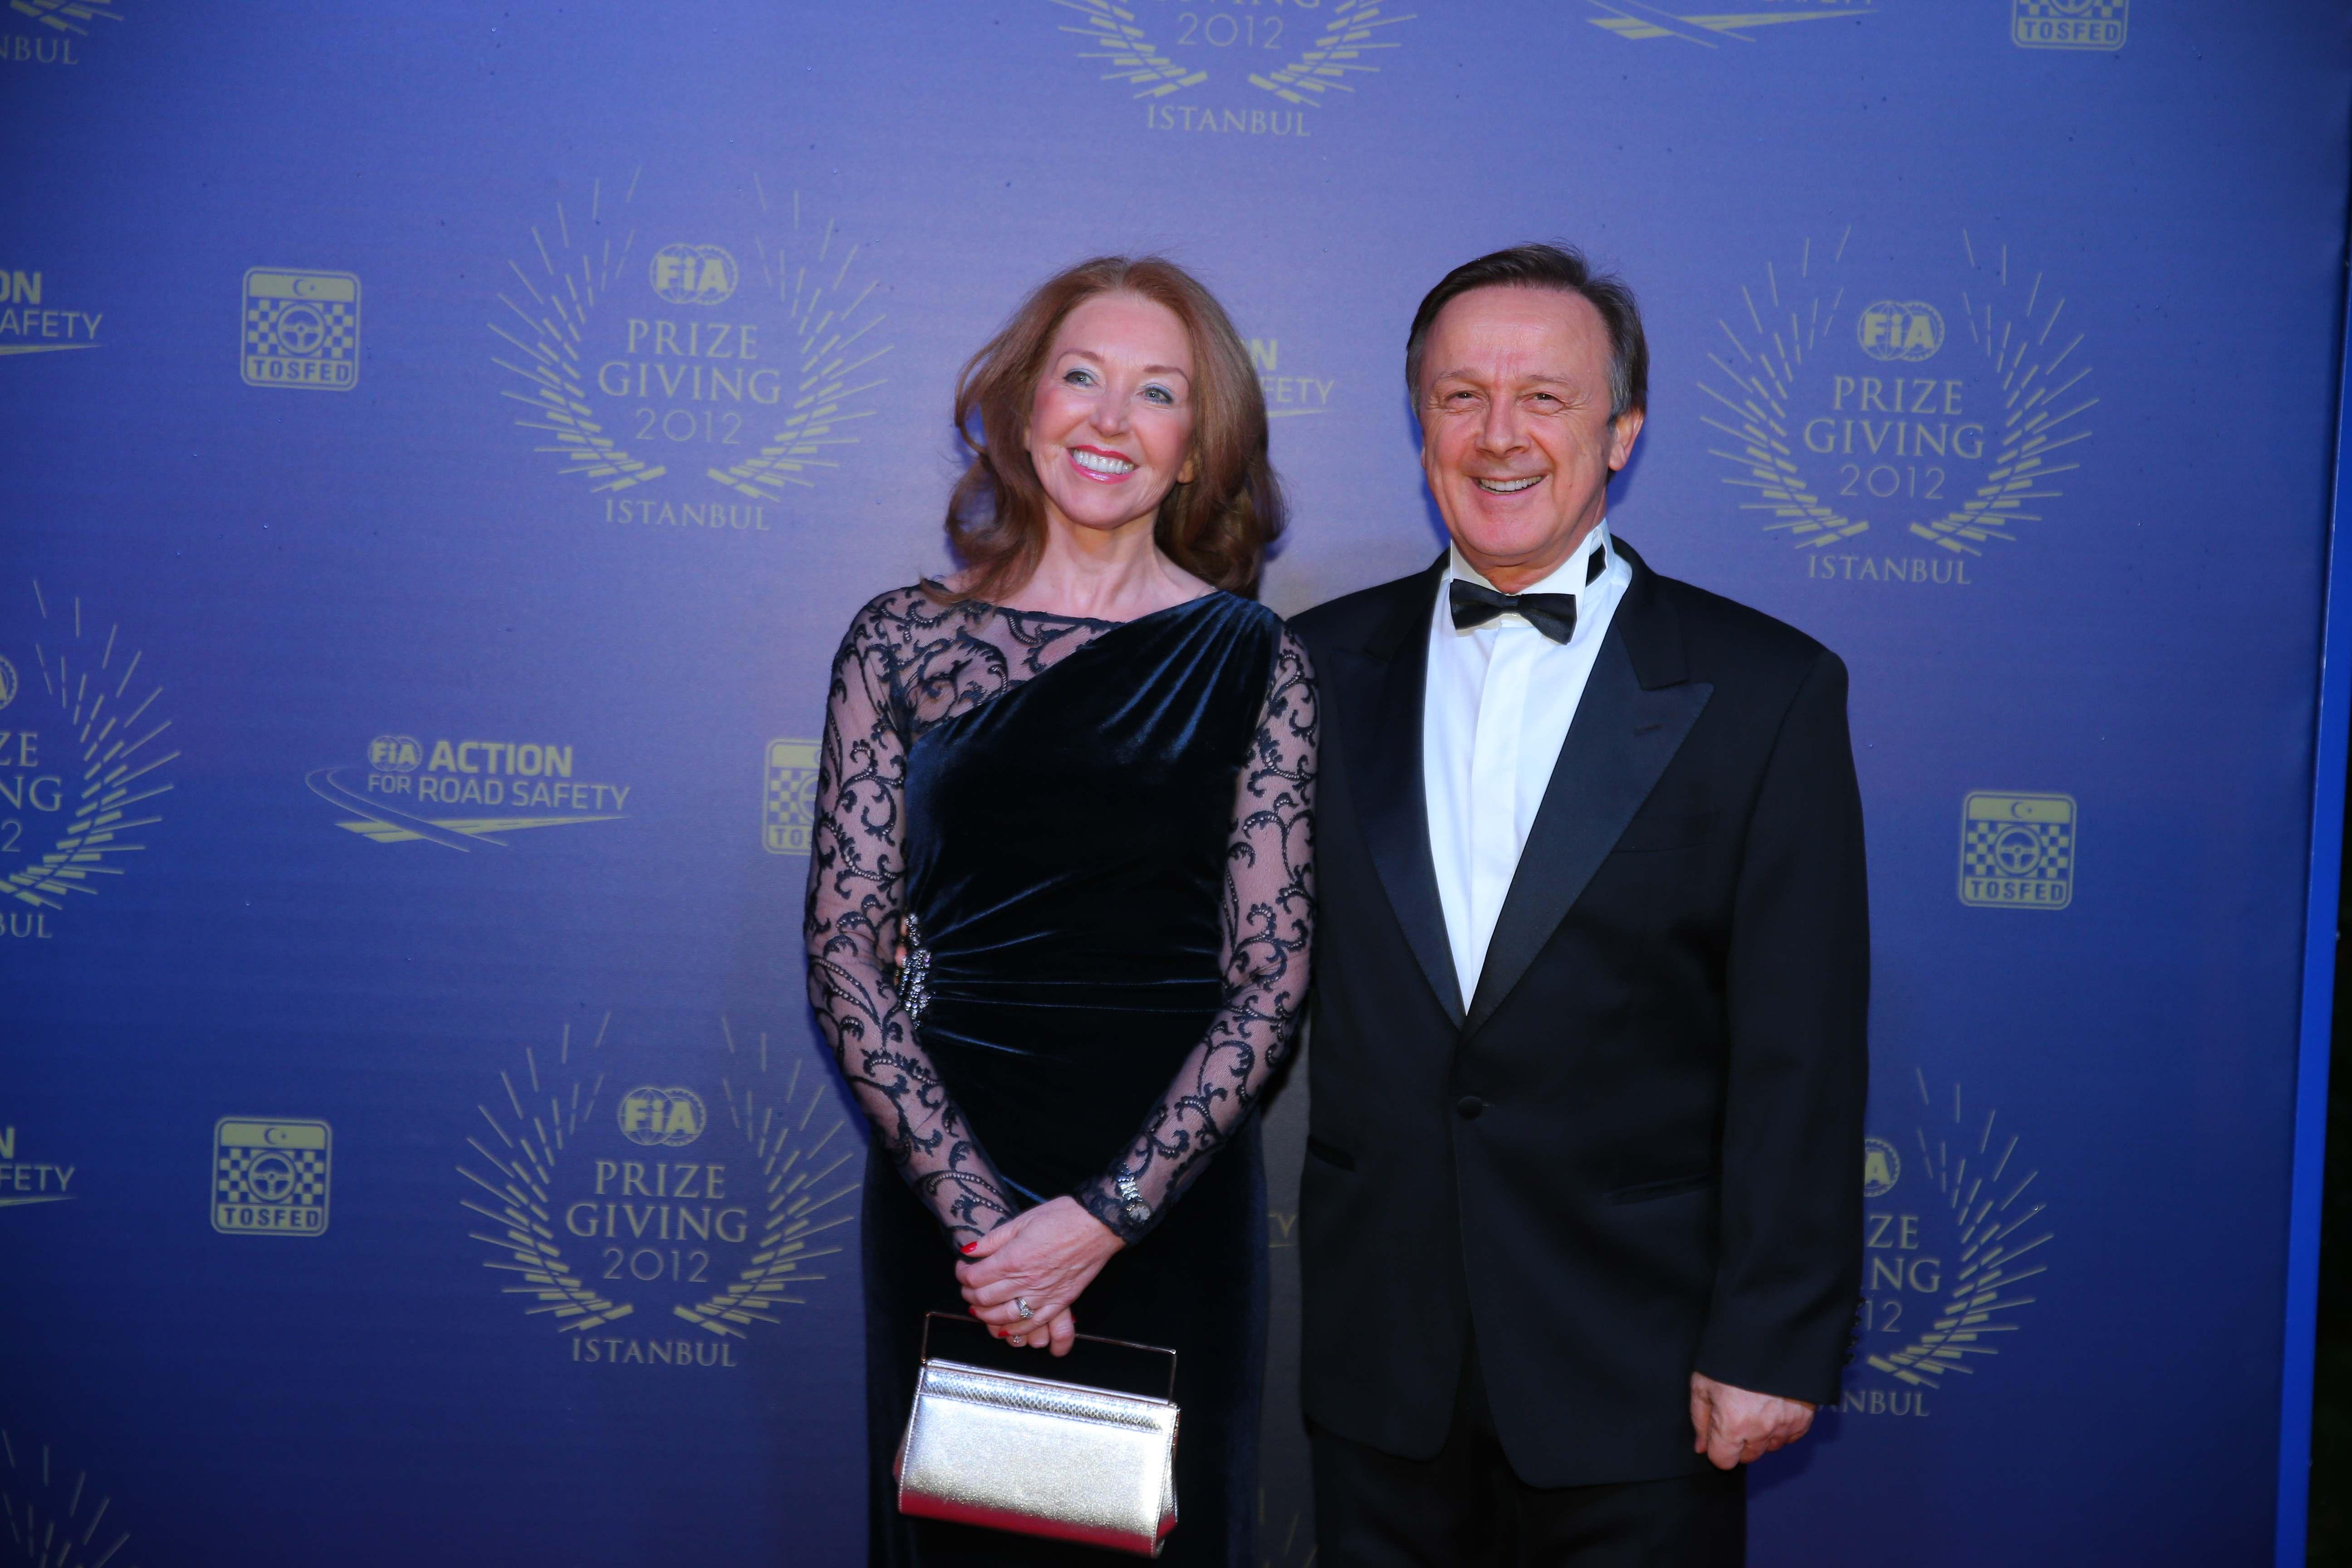 FIA Prize Giving Gala 2012